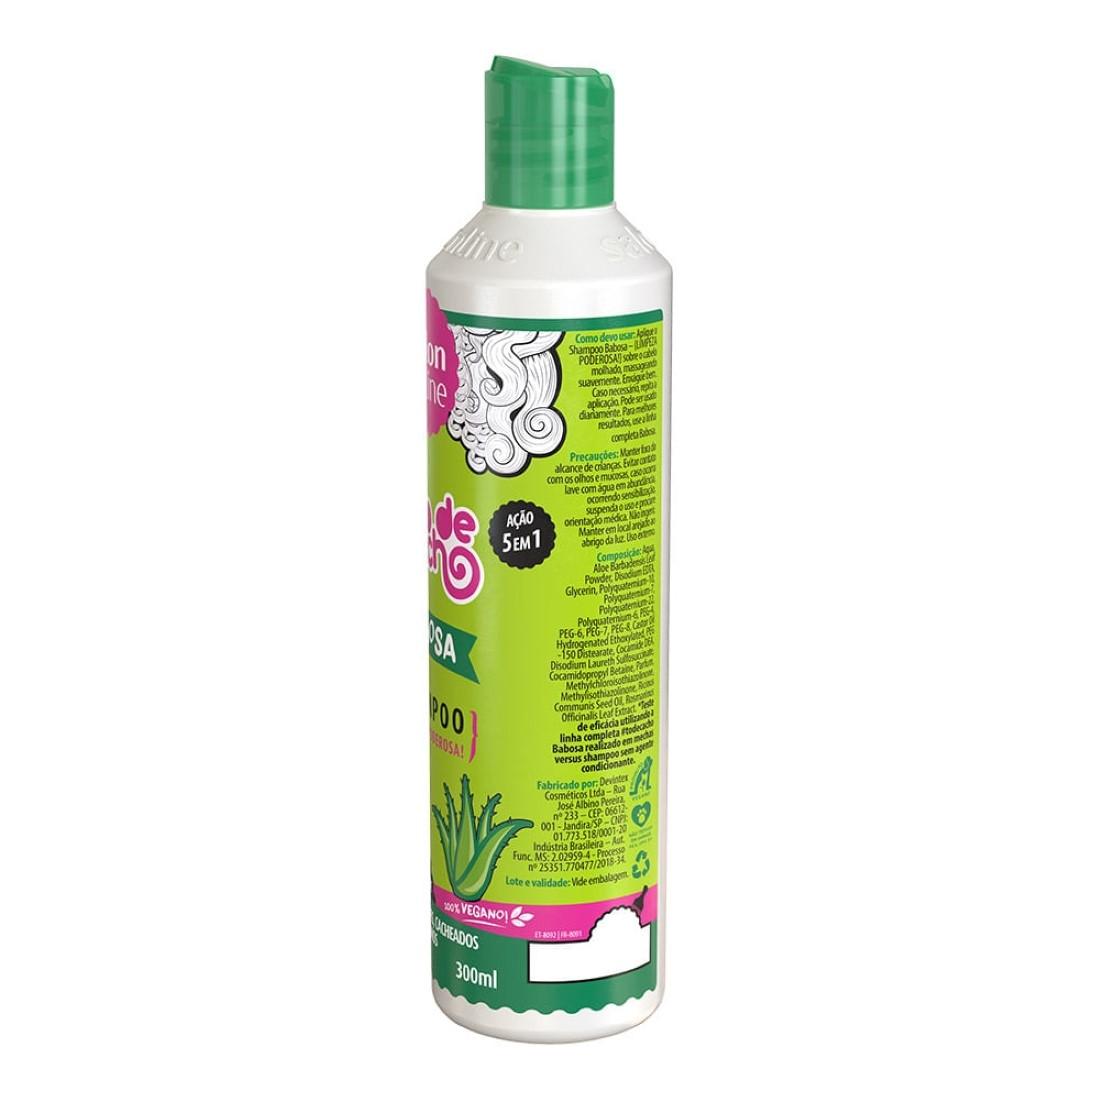 Shampoo Babosa Tratamento Pra Divar #TodeCacho 300ml - Salon Line